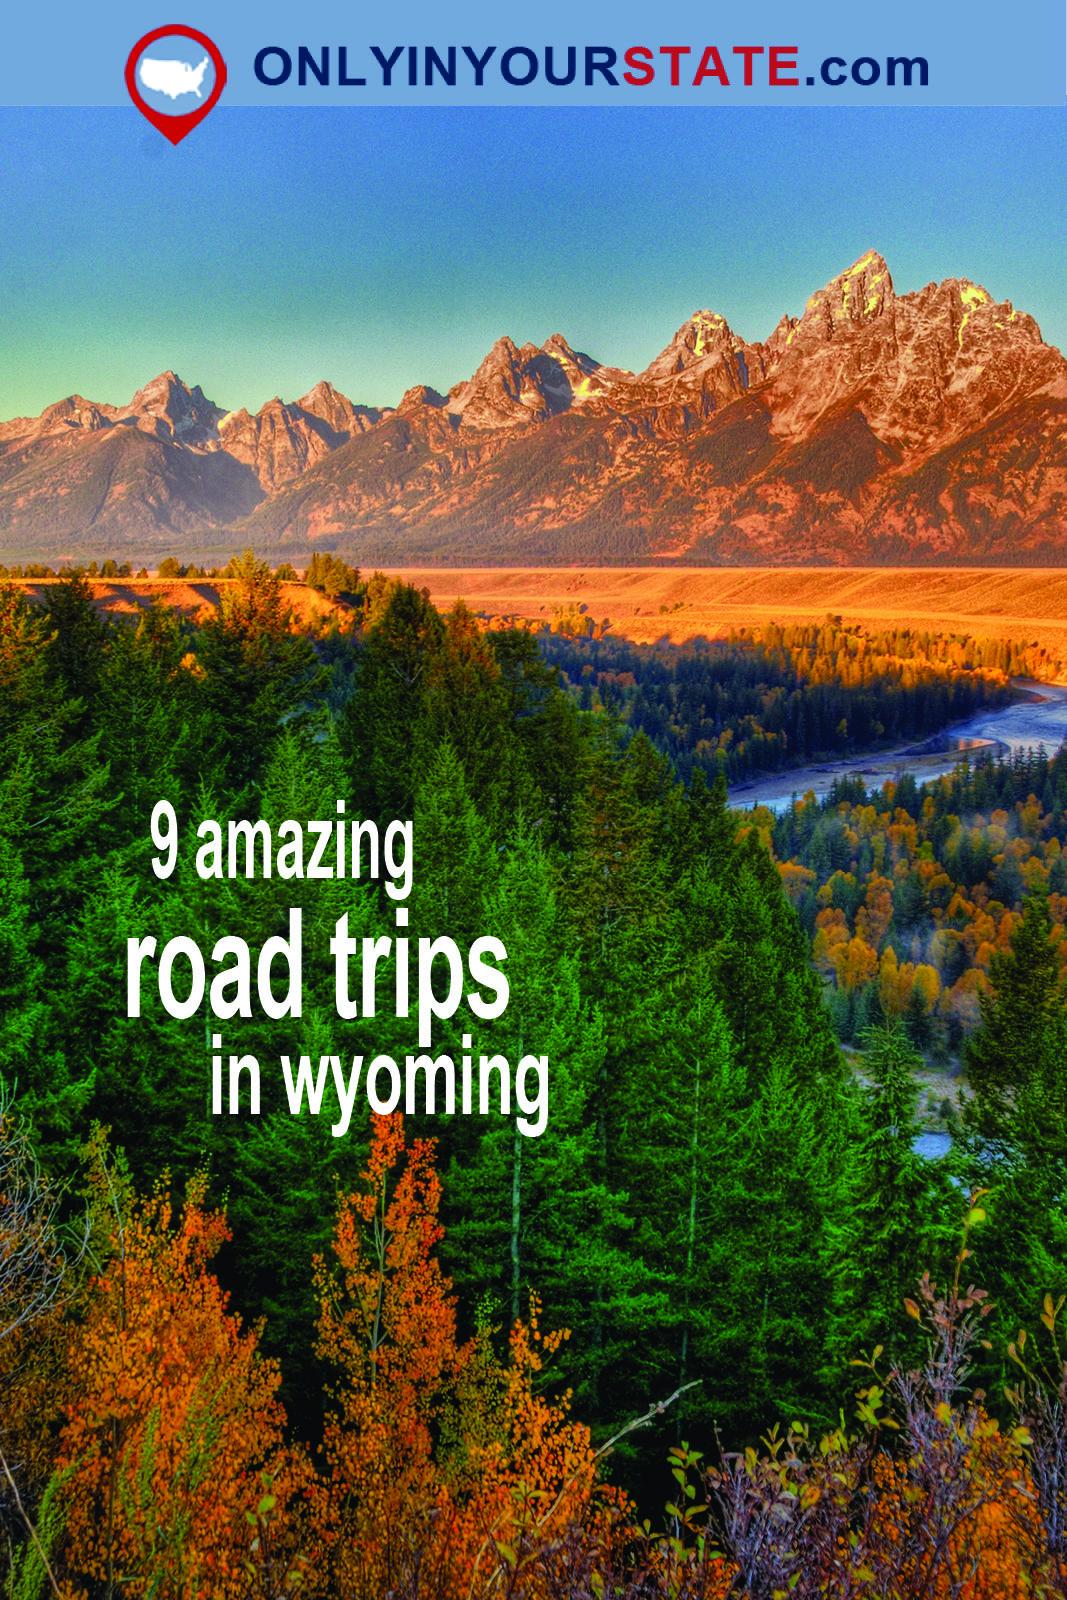 3b82c6d41f1f779bdcad4f07ce574fe2 - How Long Does It Take To Get To Wyoming